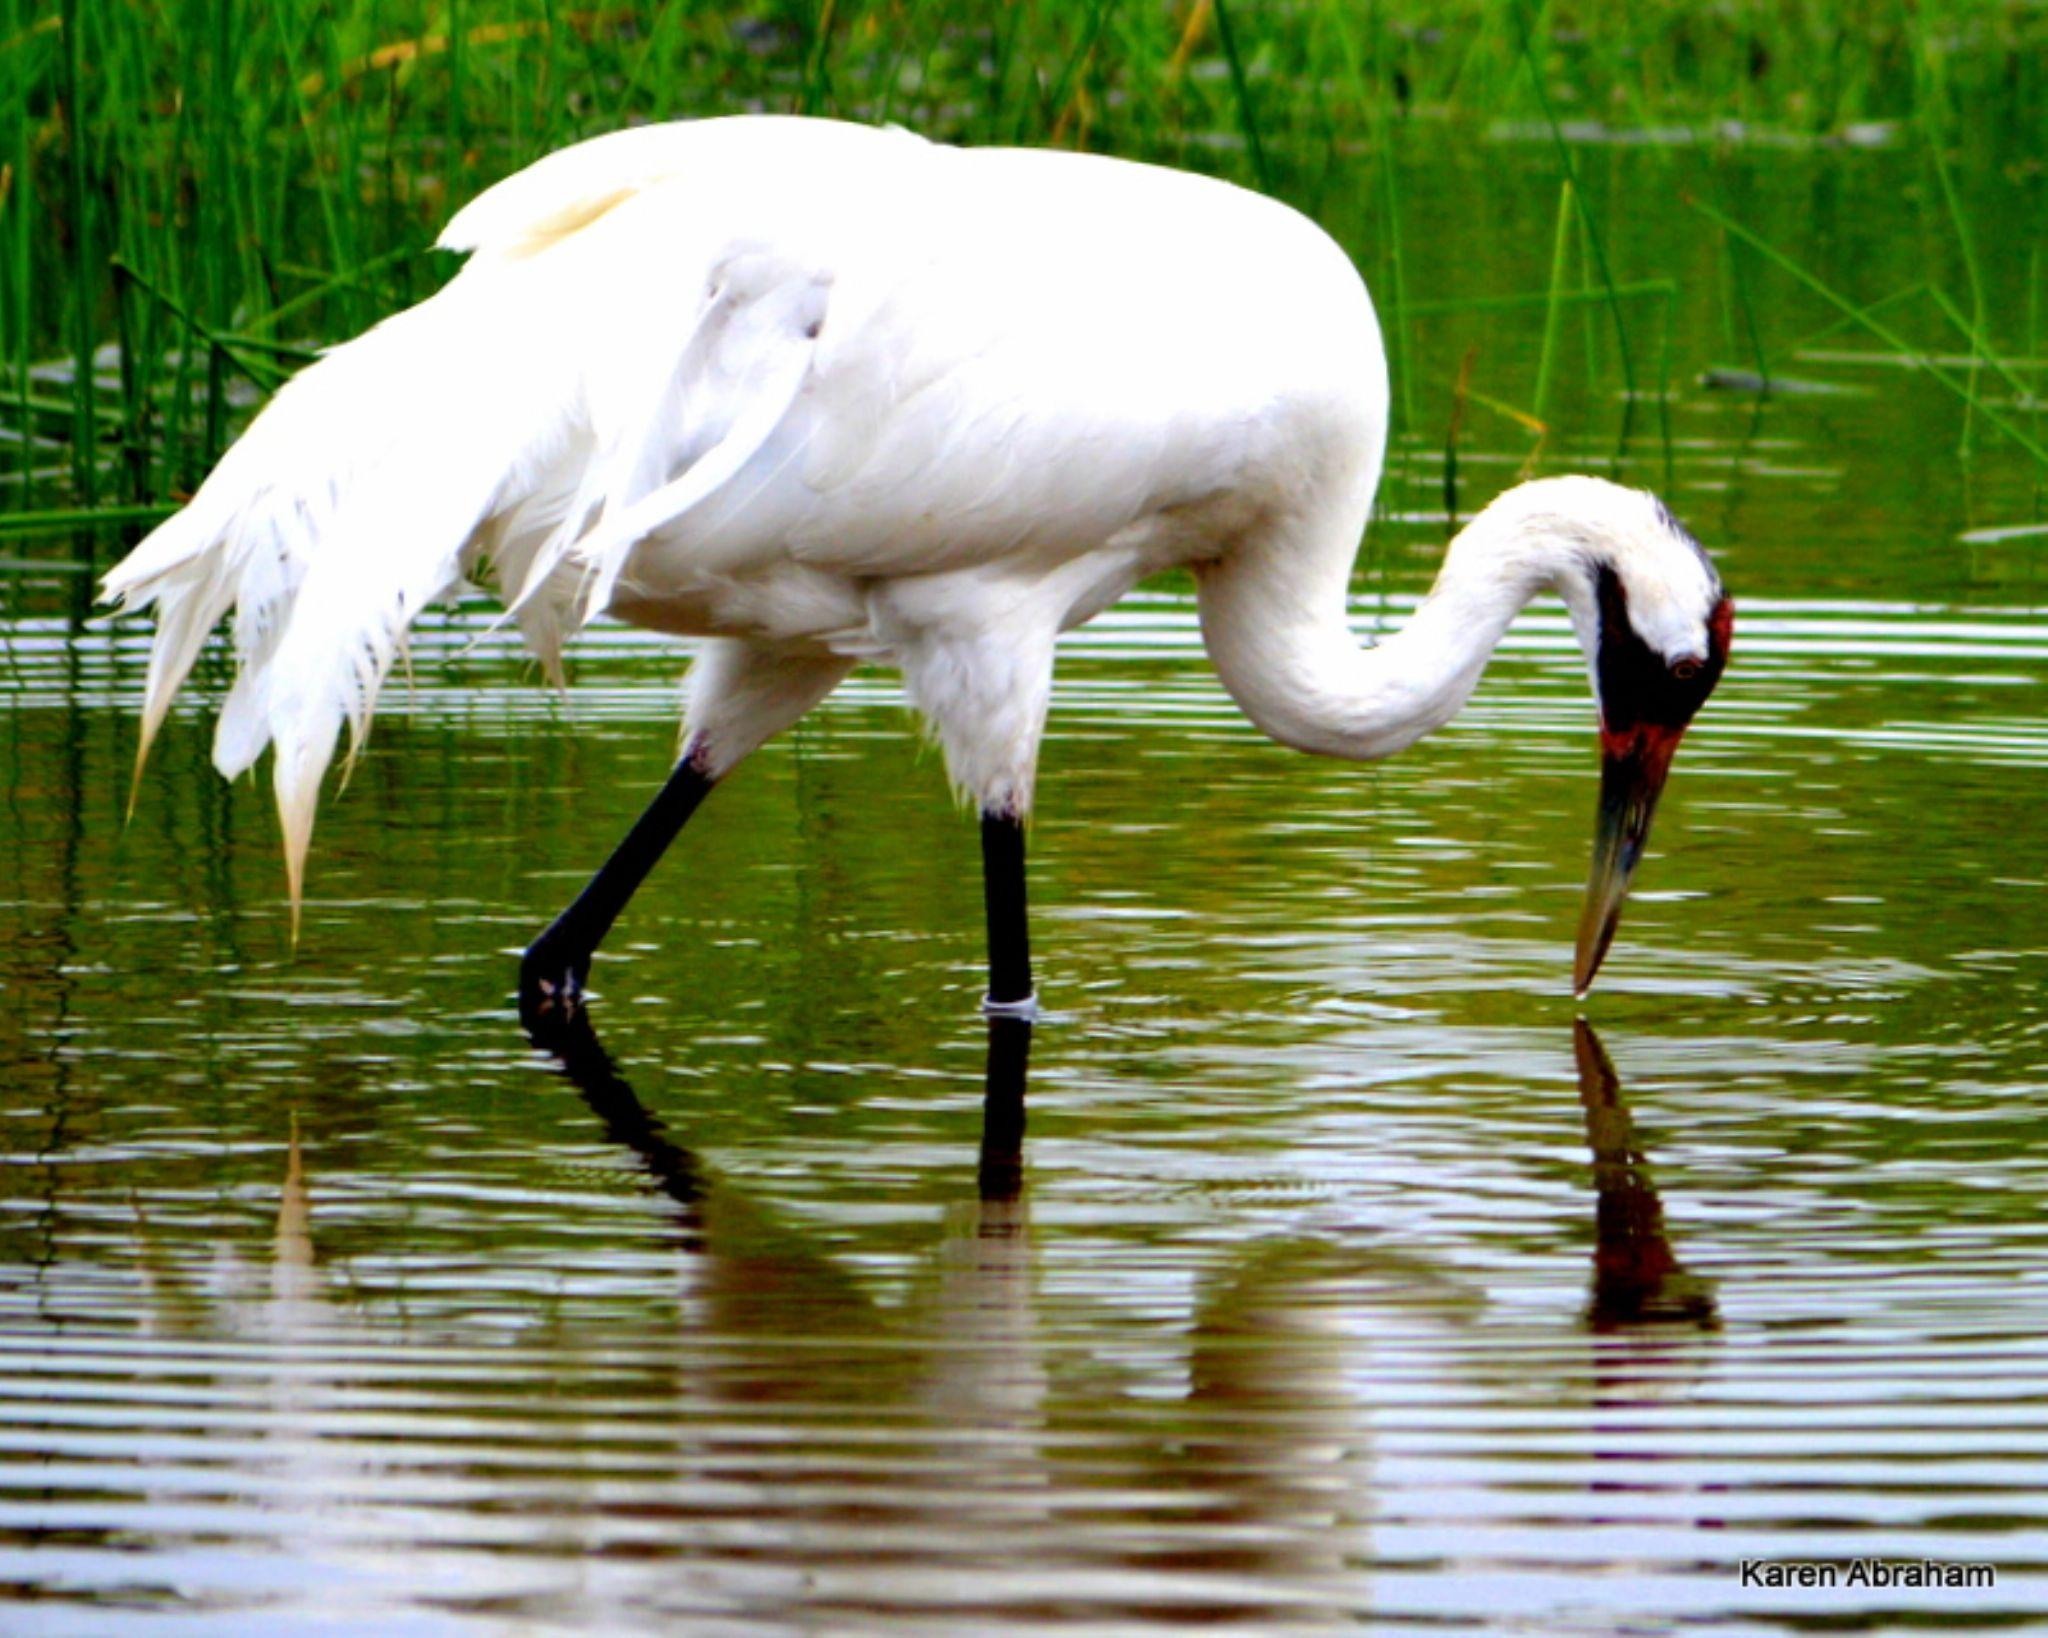 The Whooping Crane by Karen Mayer